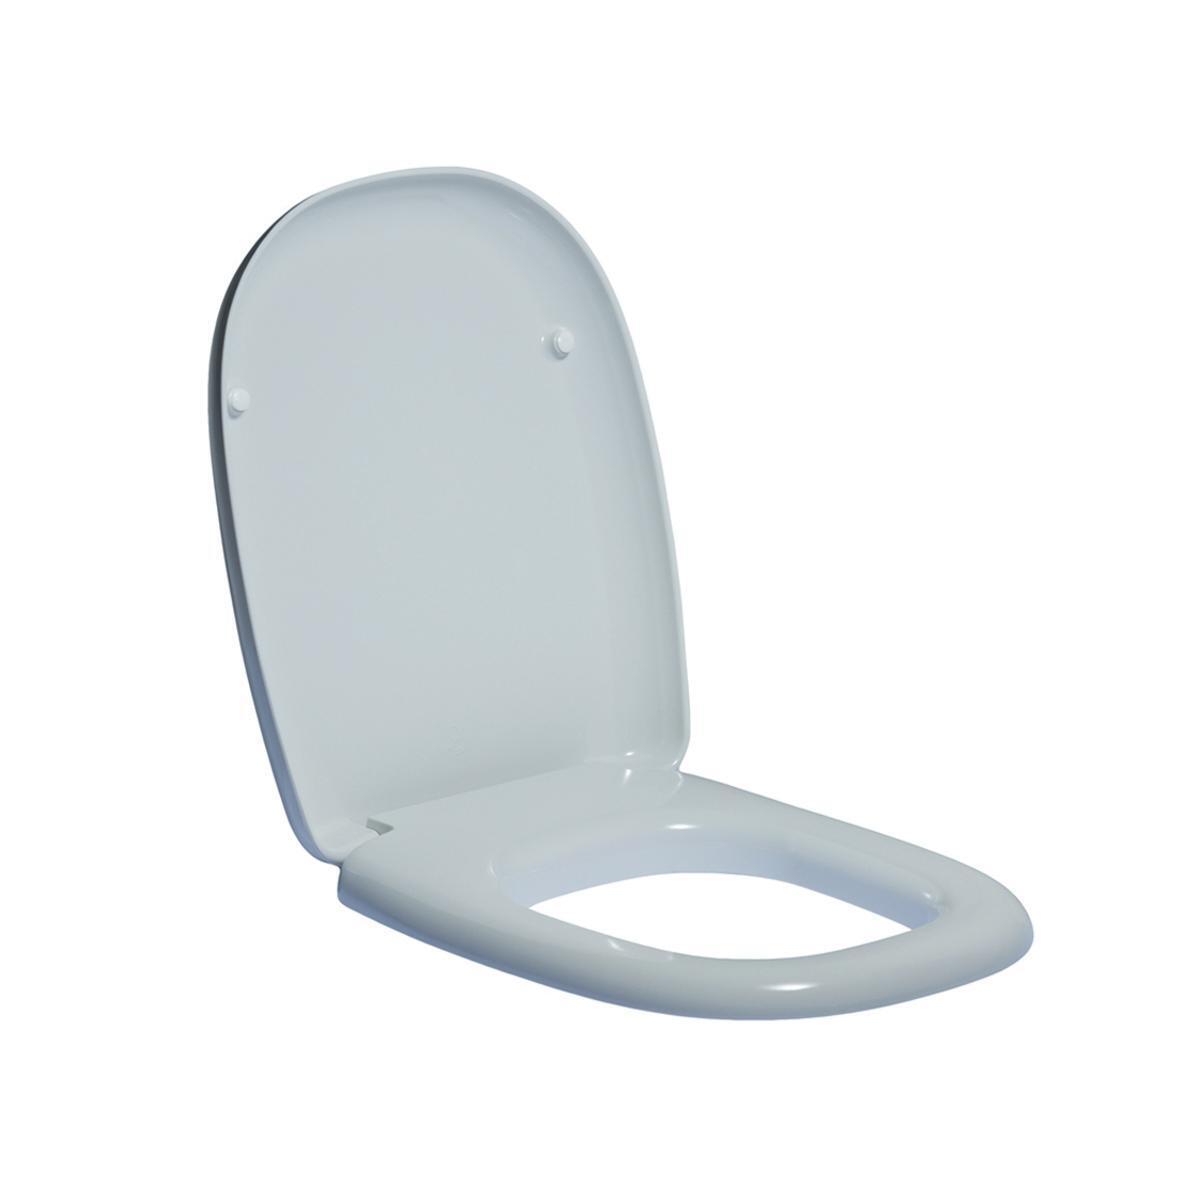 Copriwater rettangolare Originale per serie sanitari Tesi IDEAL STANDARD termoindurente bianco - 6